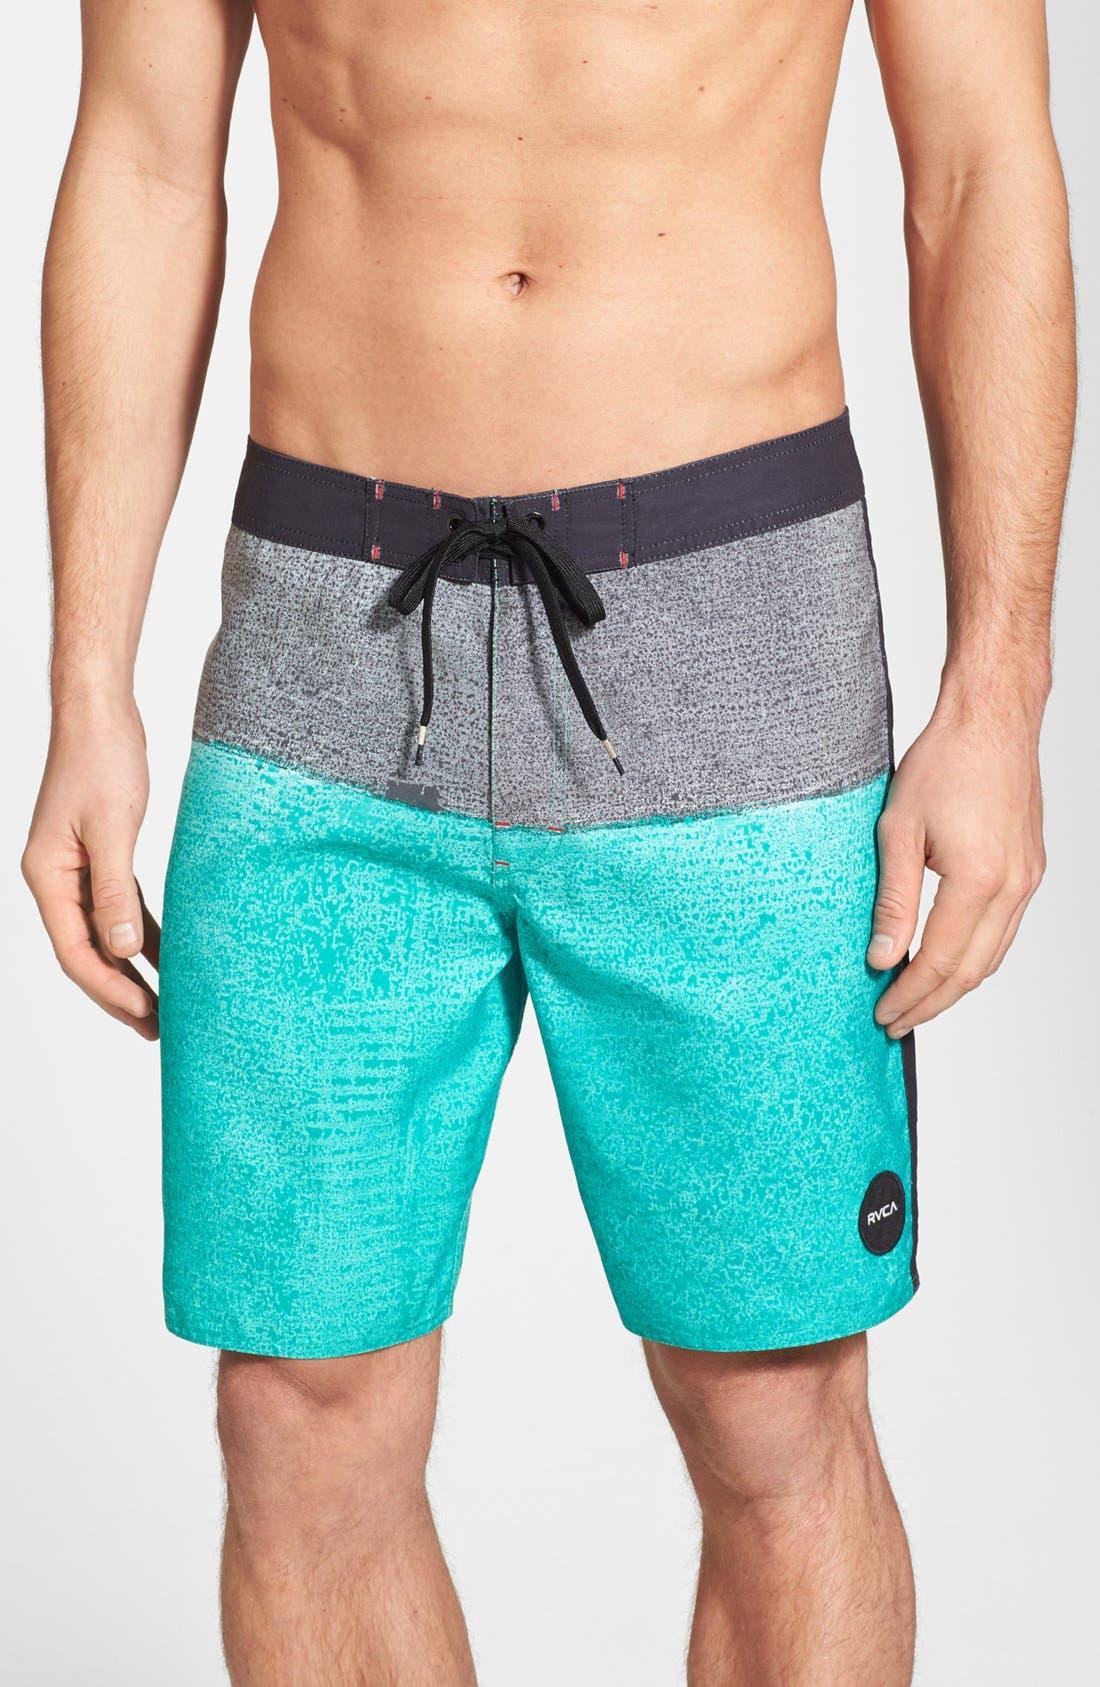 Alternate Image 1 Selected - RVCA 'Buoy' Board Shorts